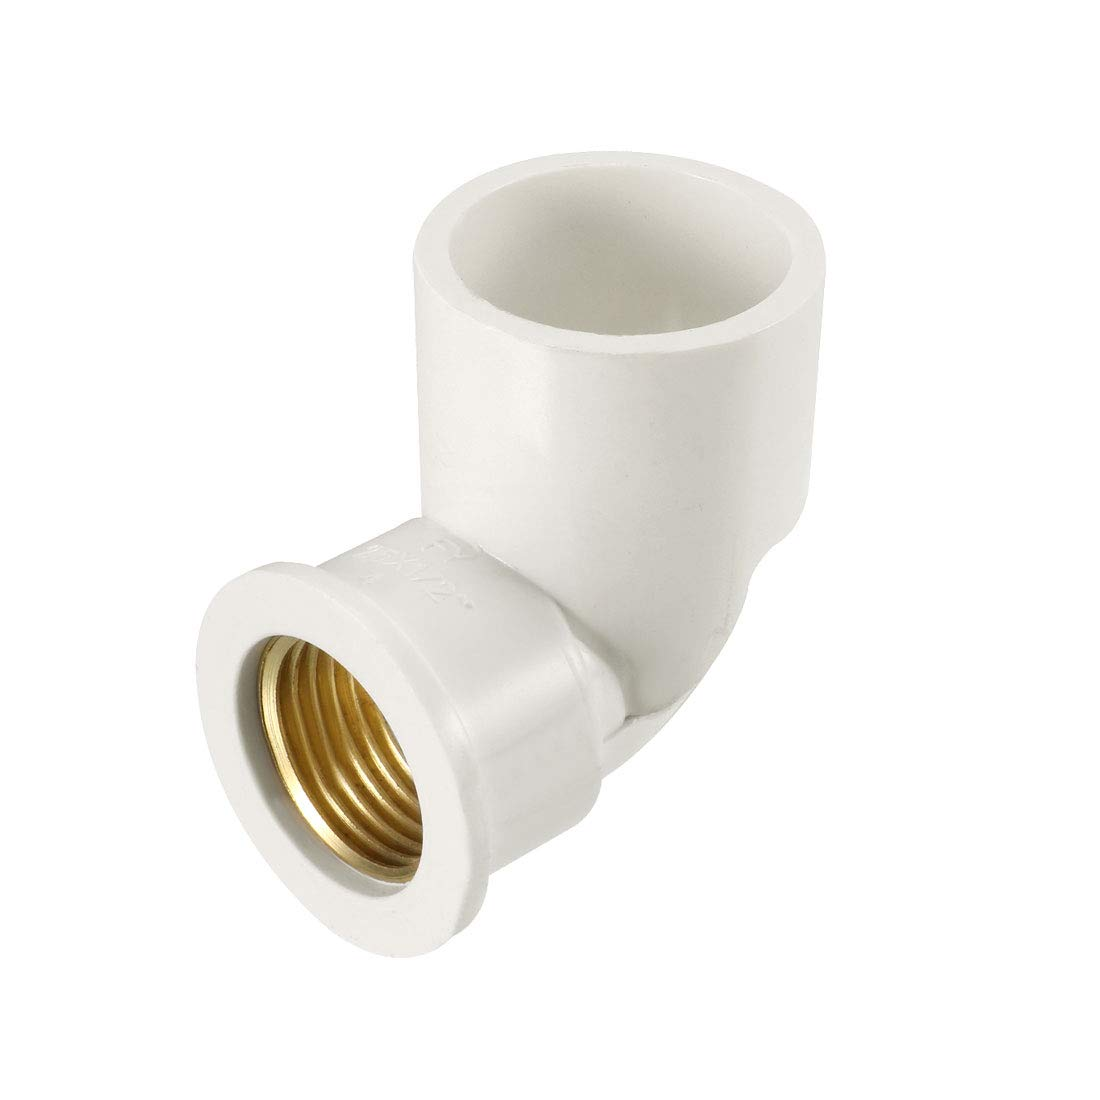 uxcell 32mm Slip x 3//4PT Female Thread 90 Degree PVC Pipe Fitting Elbow 3 Pcs